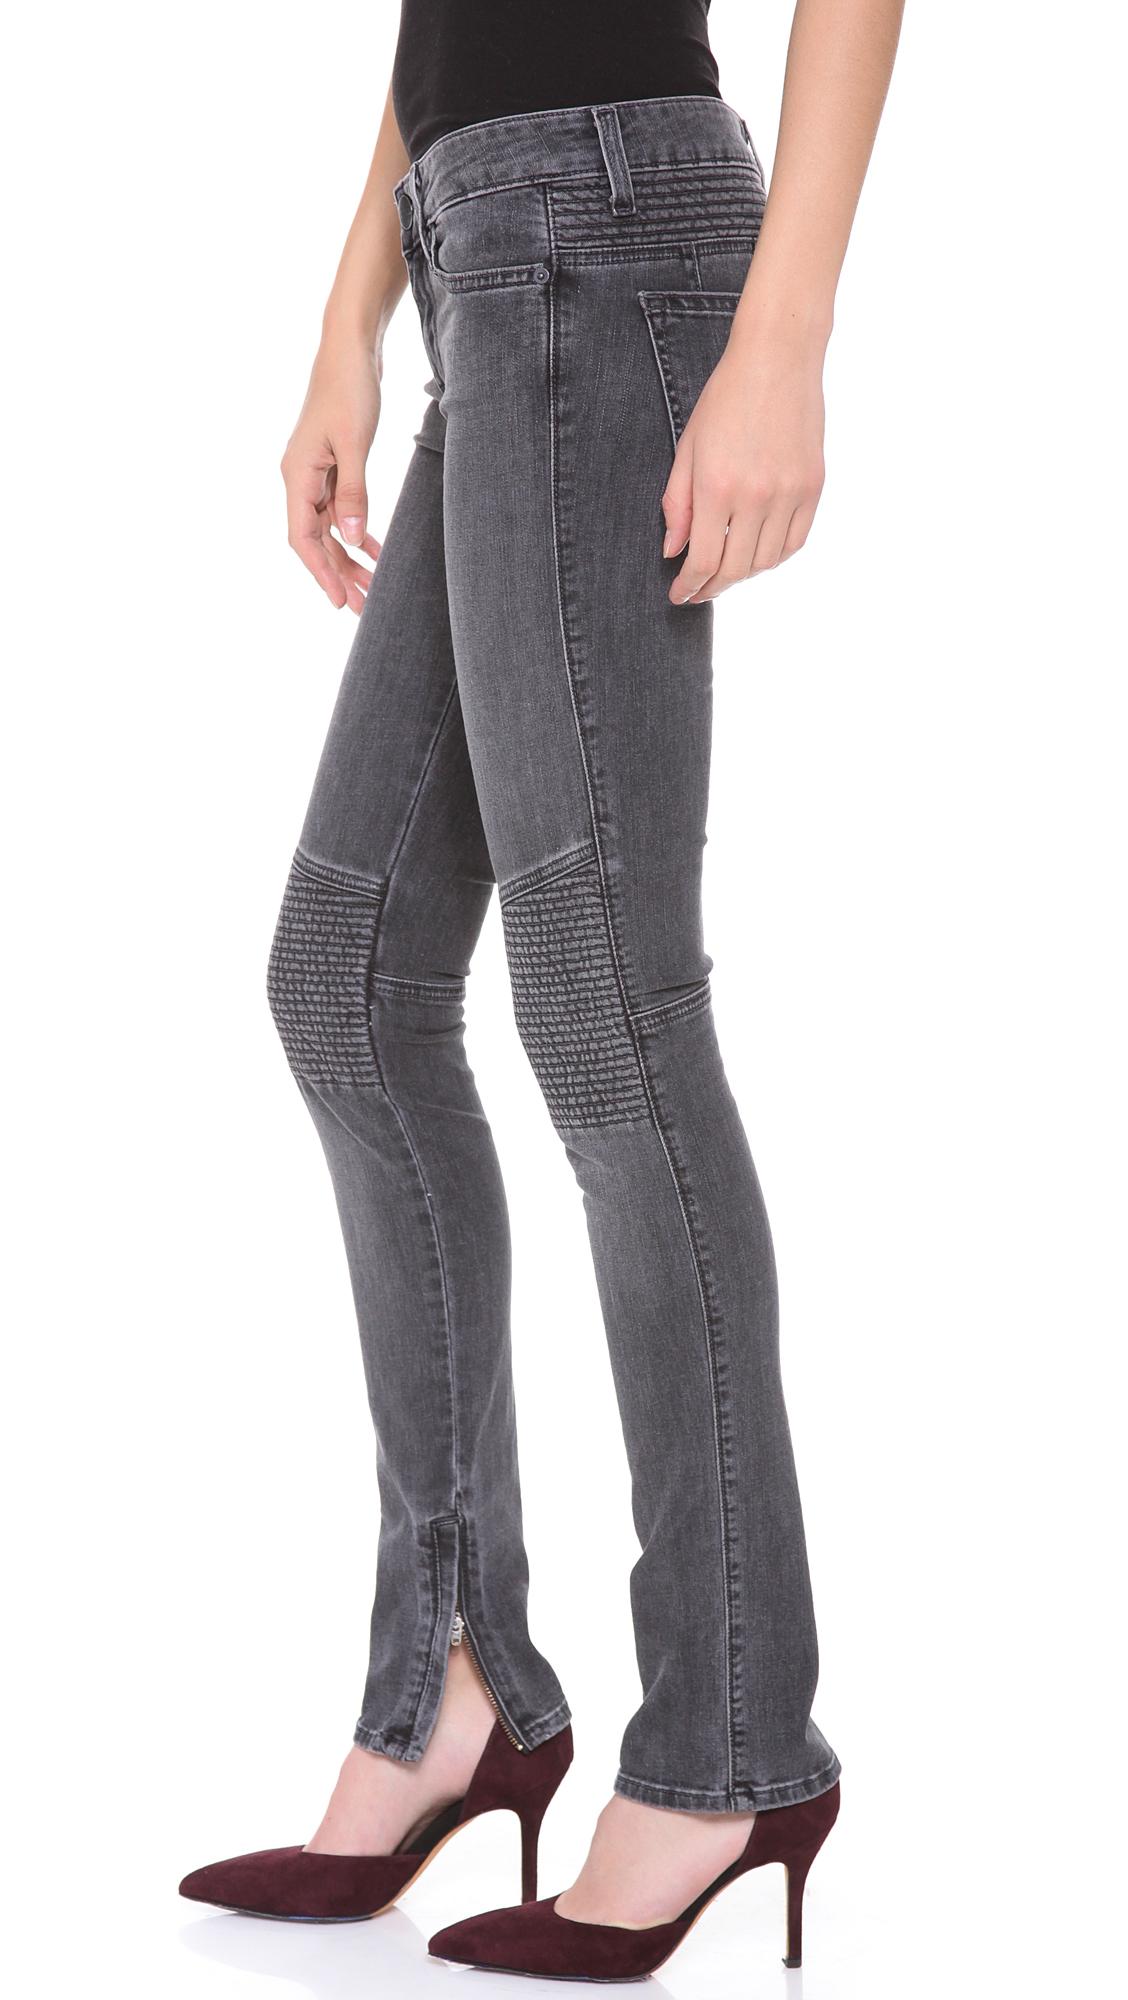 Lyst Vince Ankle Zip Moto Pants In Gray